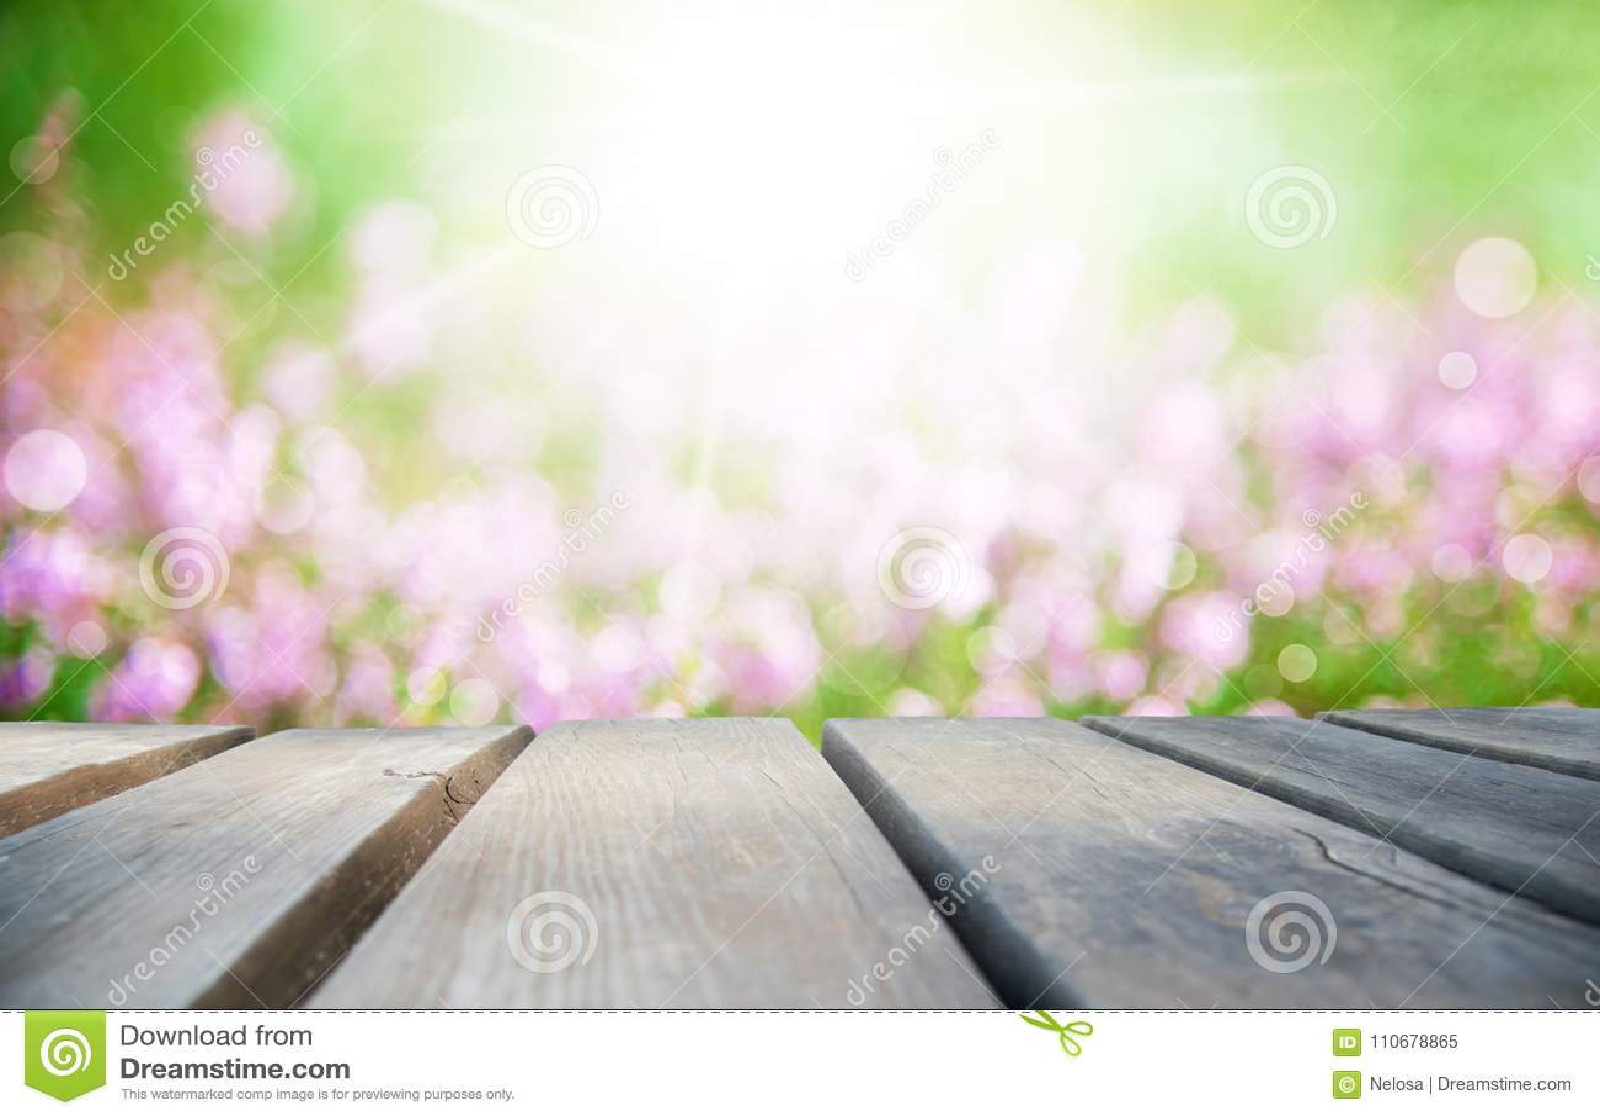 Tablero de madera con Sunny Erica Flower Field As Background